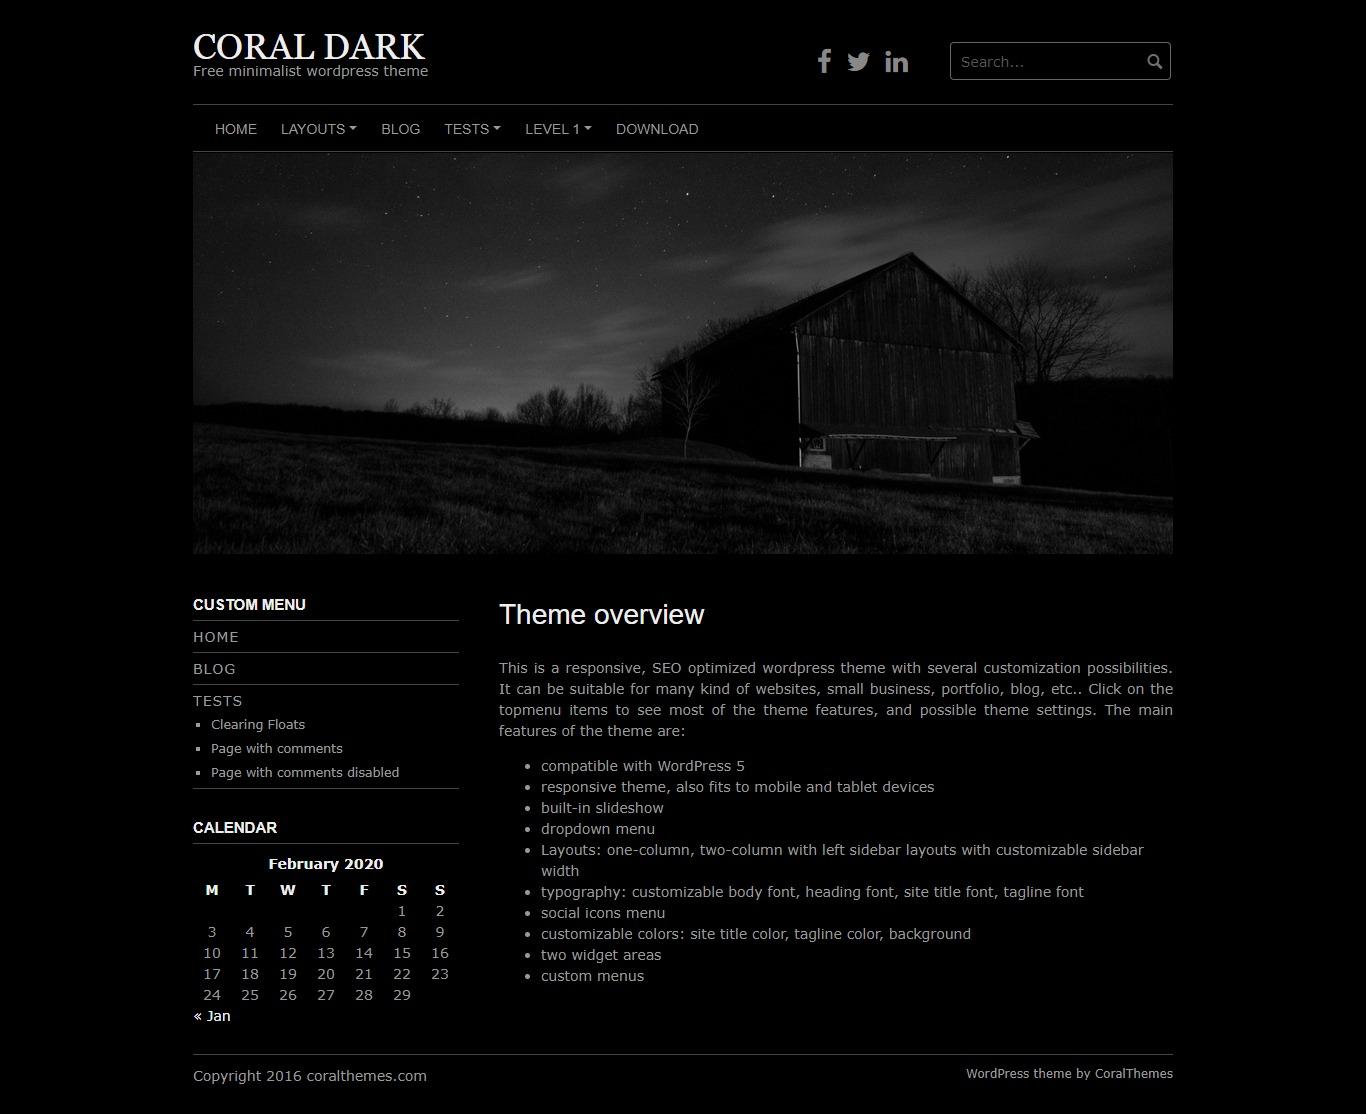 Coral Dark